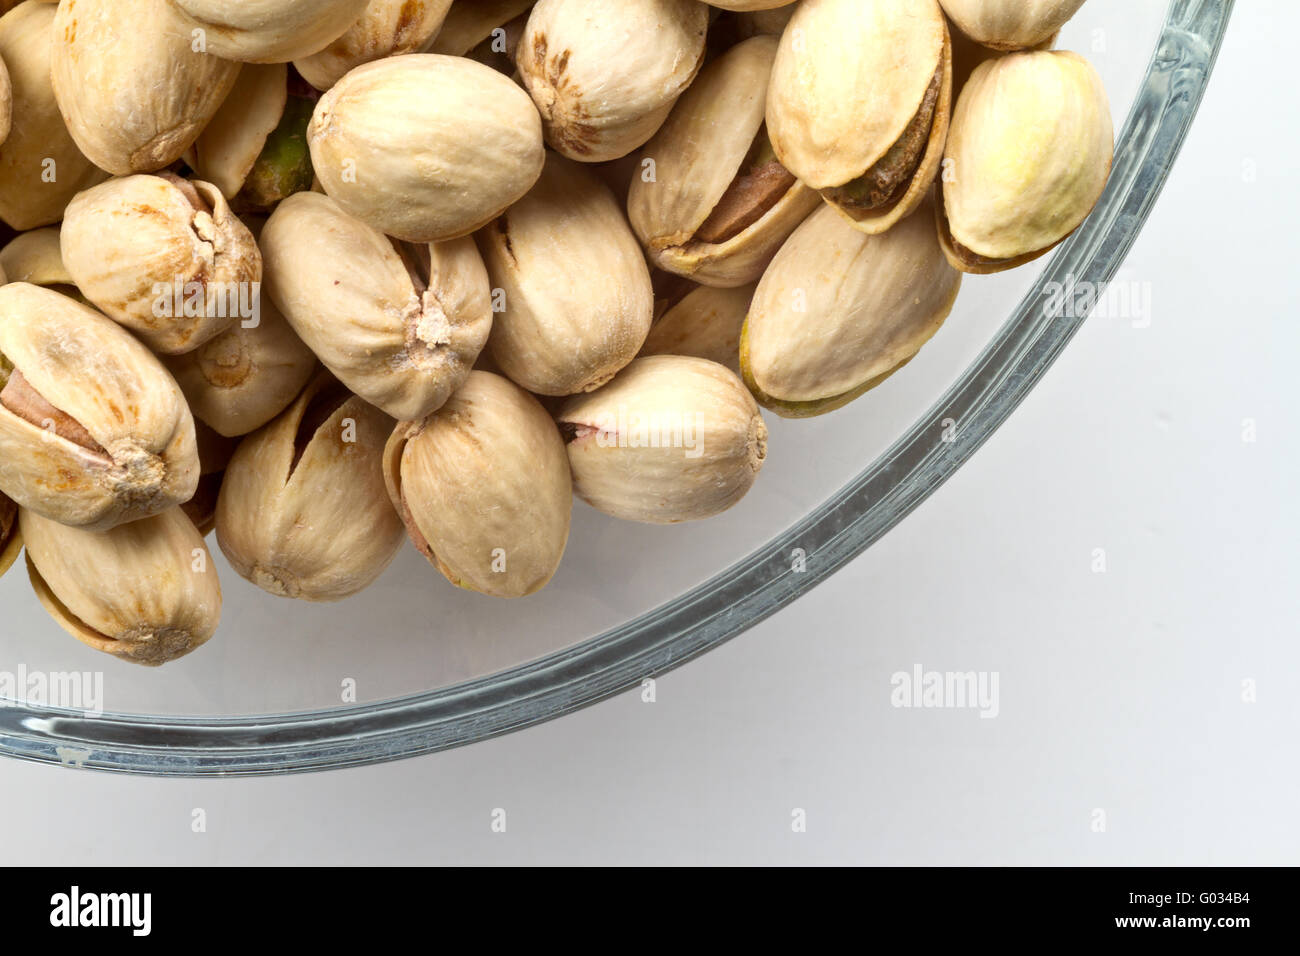 Bol en verre de pistaches Photo Stock